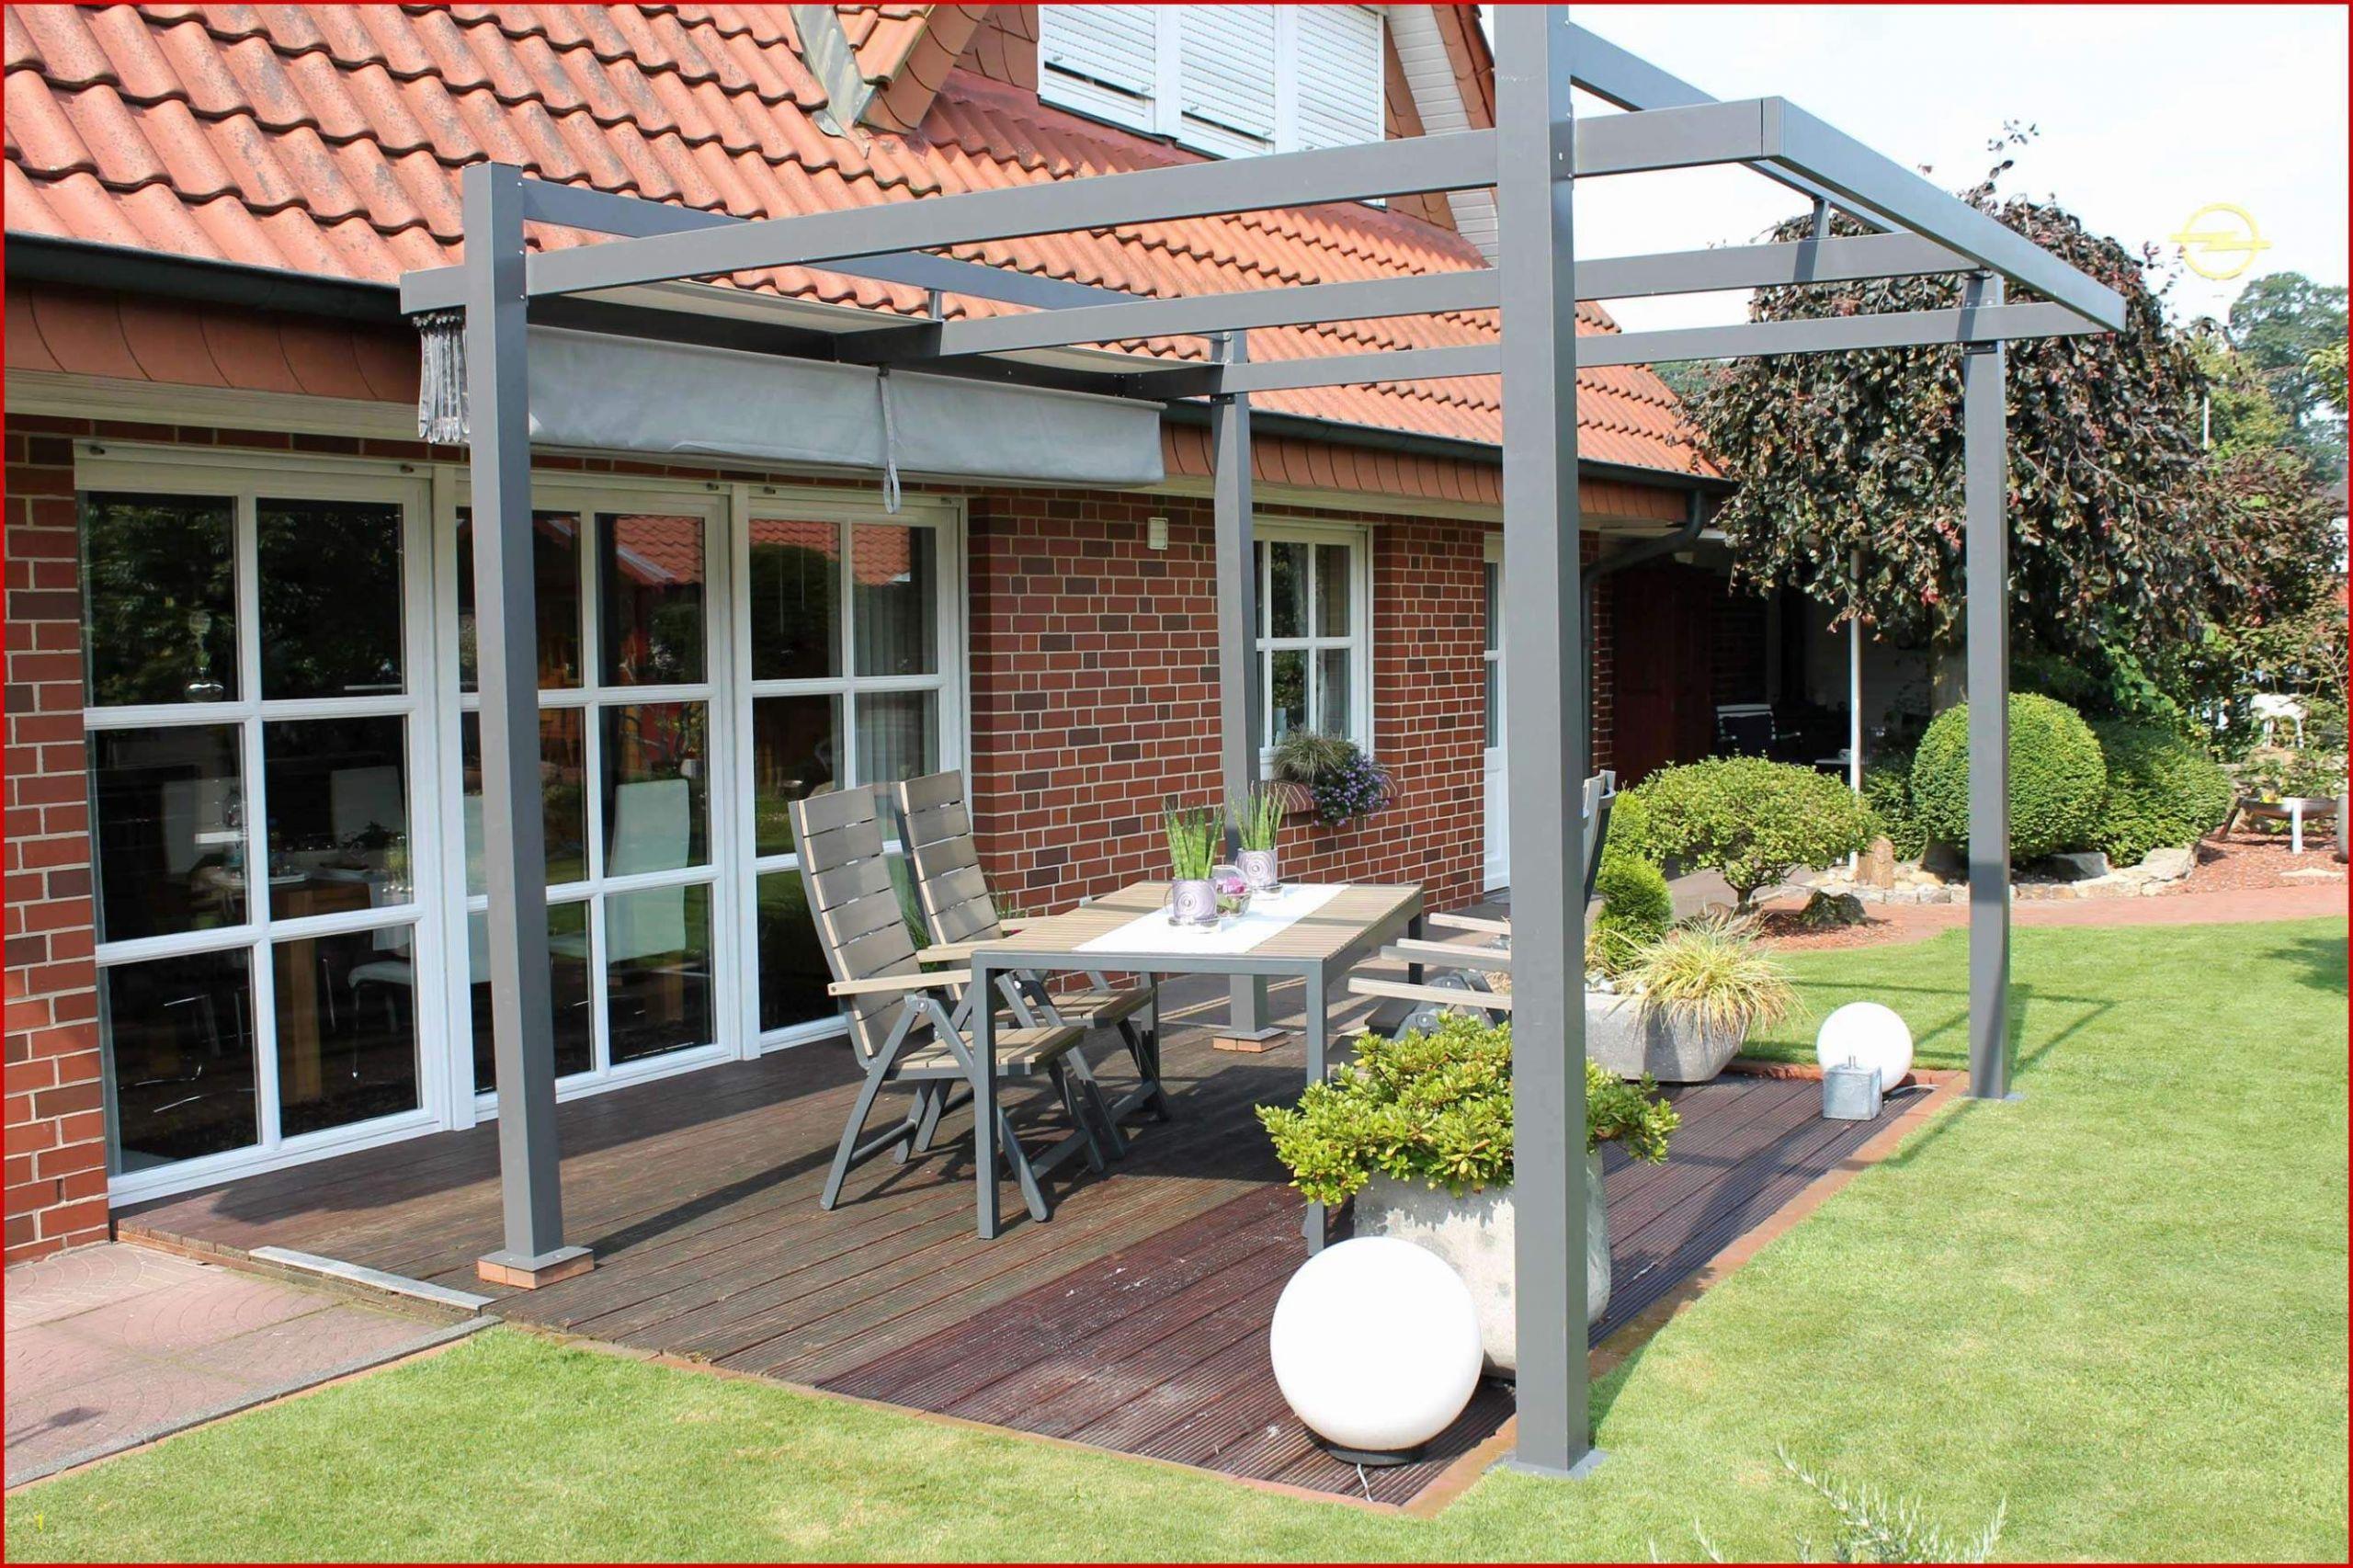 46 neu terrassenuberdachung aus holland stock wintergarten aus holland wintergarten aus holland 4